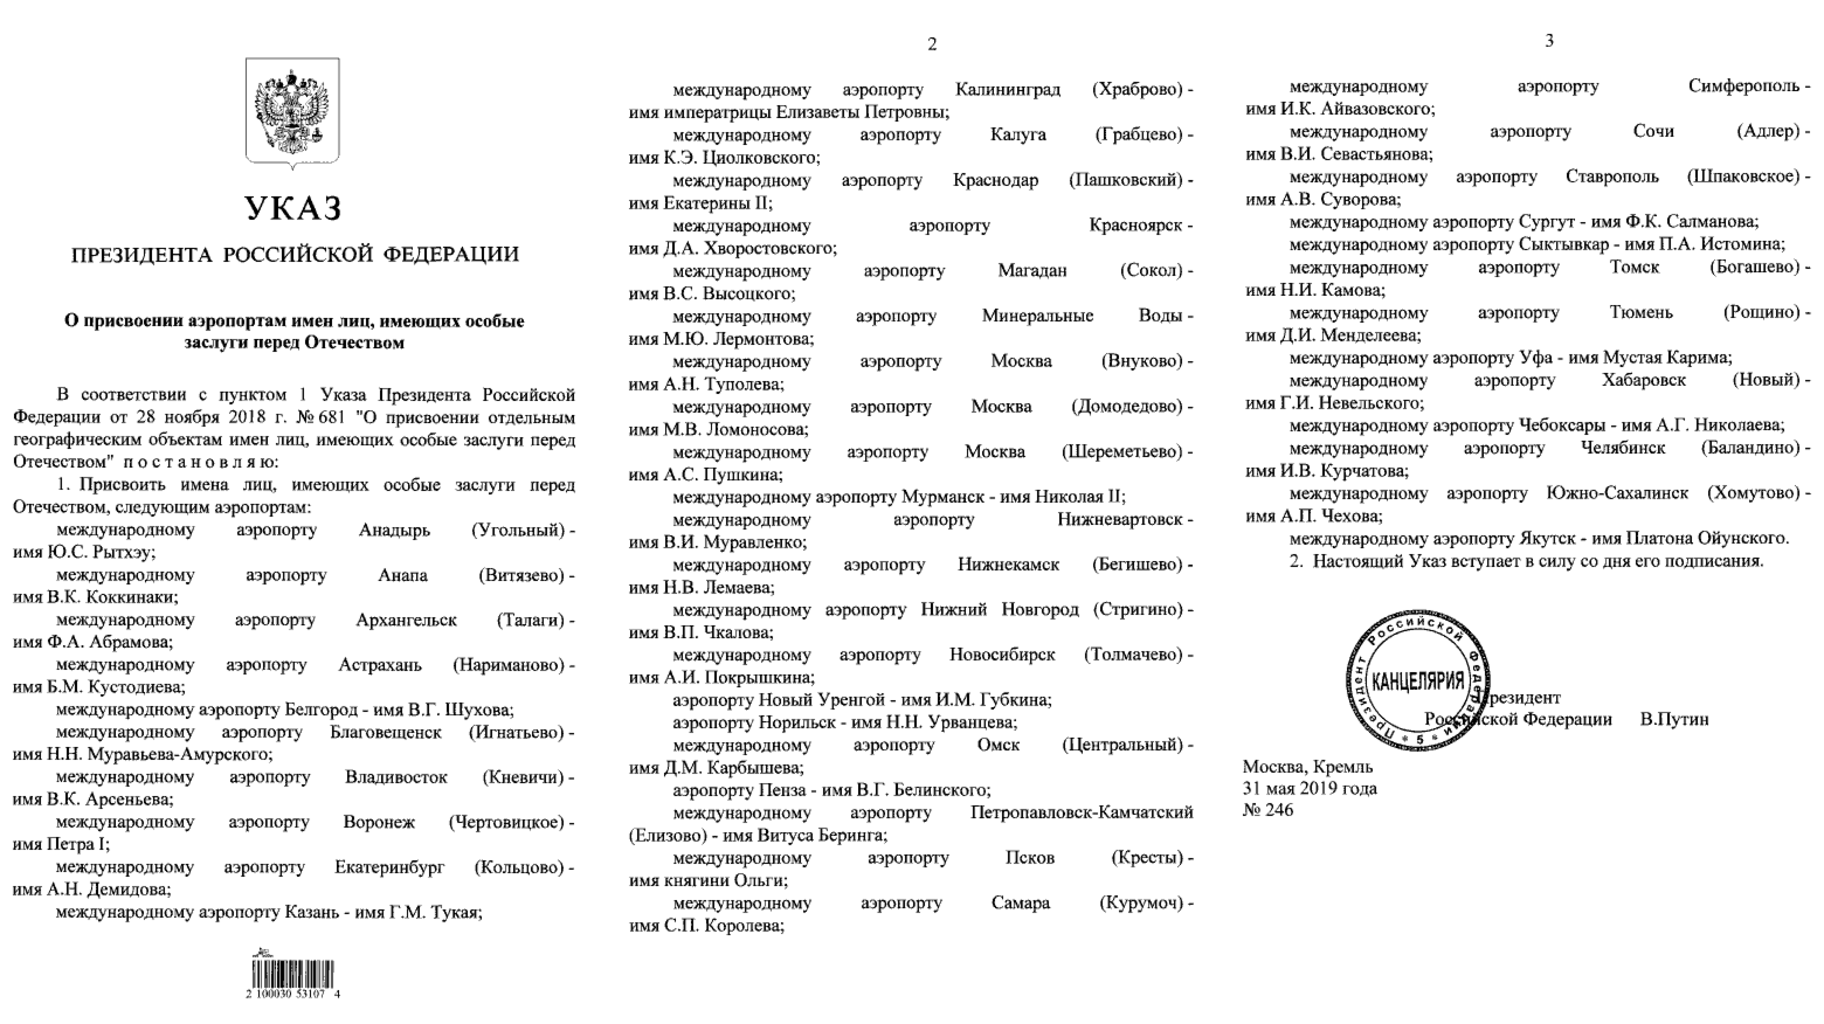 Документ взят с сайта: pravo.gov.ru